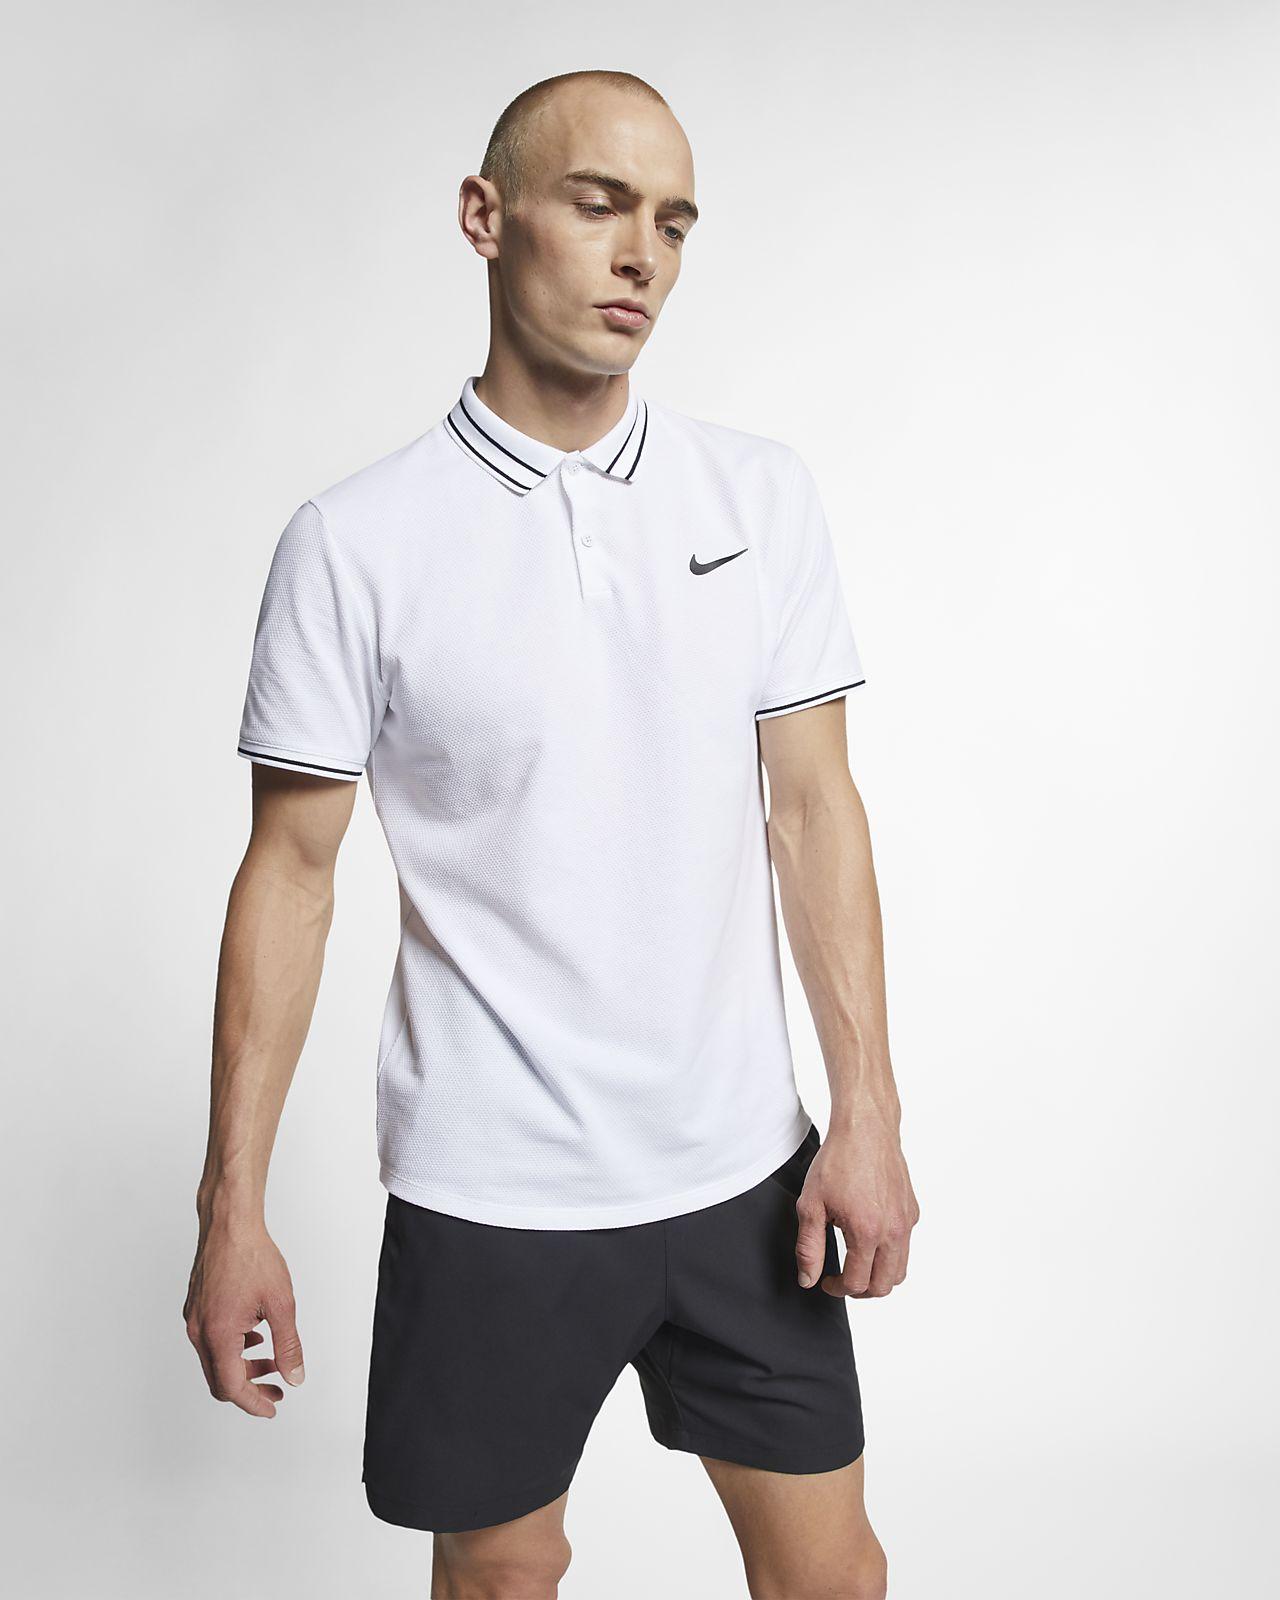 NikeCourt Advantage-tennispolo til mænd